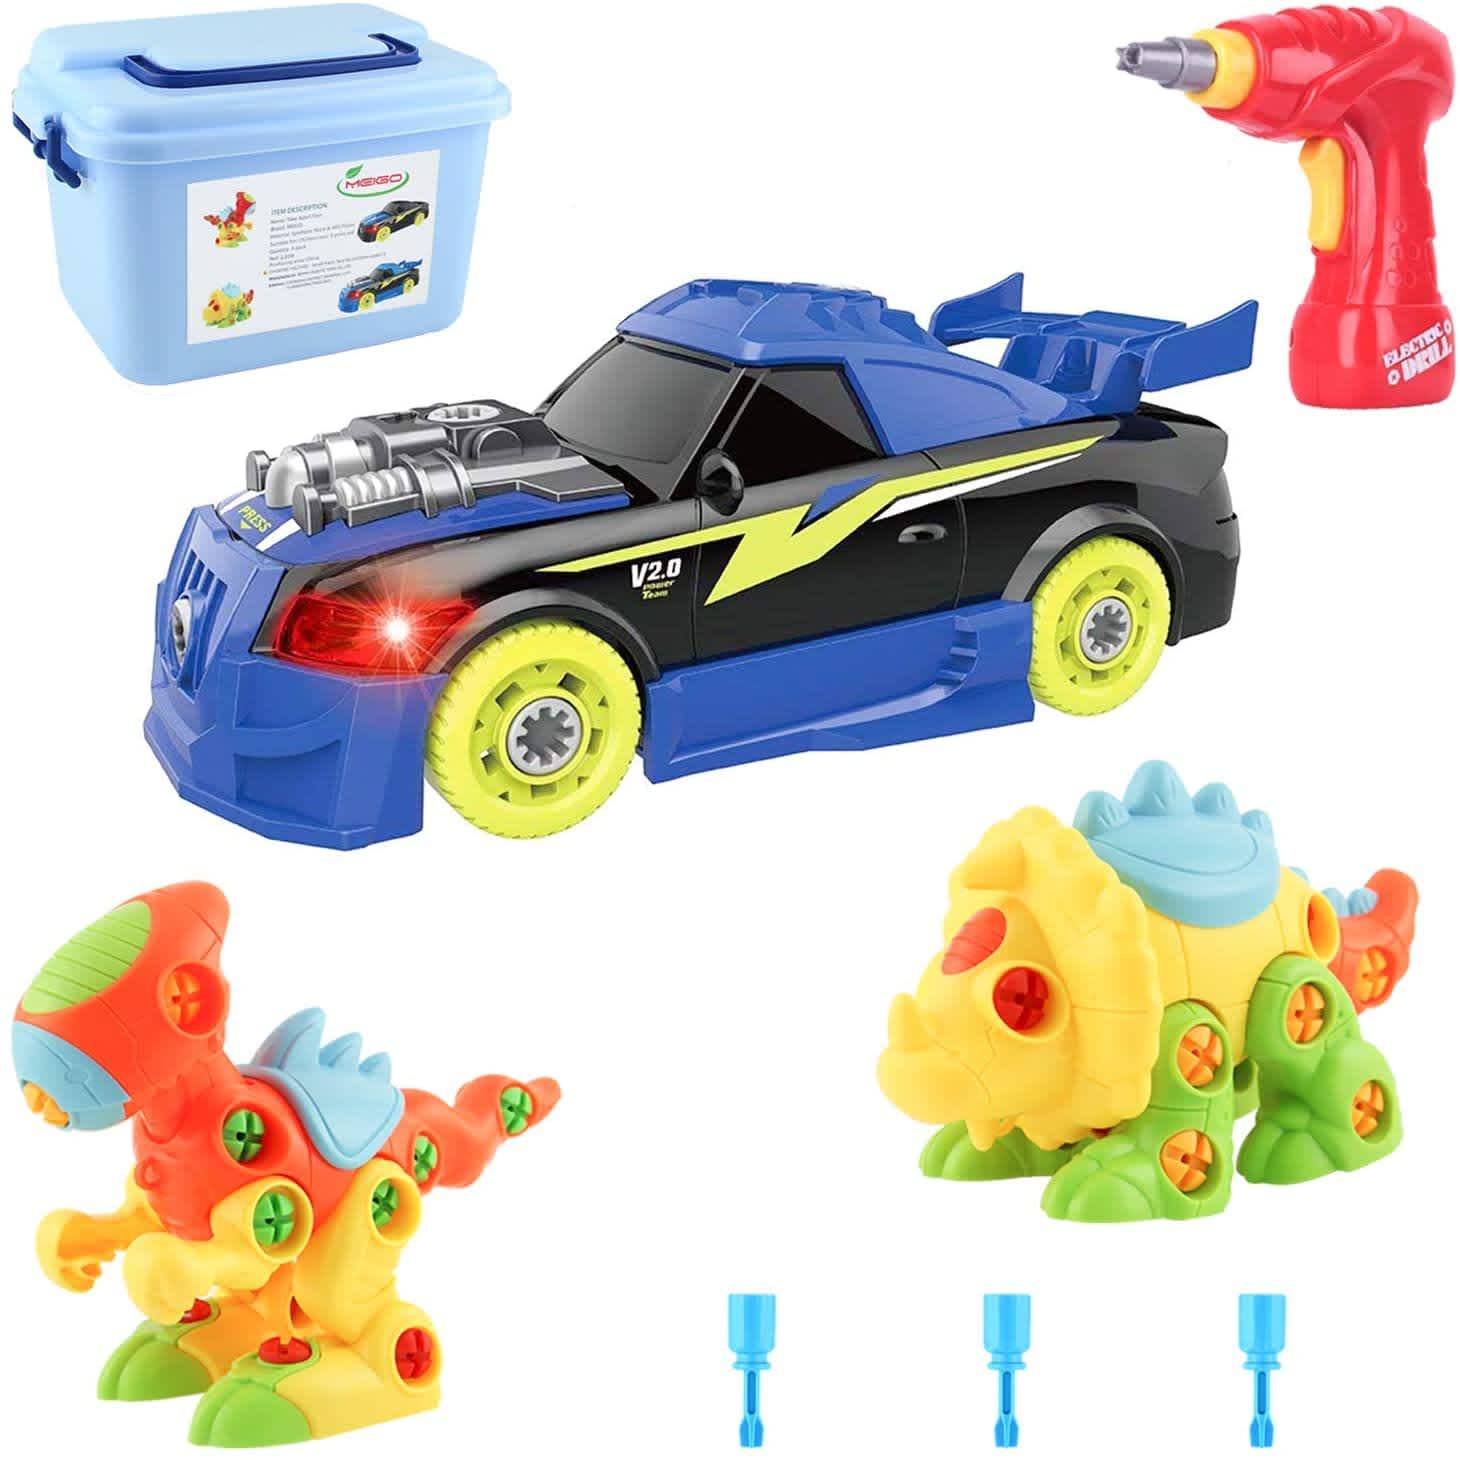 Meigo Take-Apart Toy STEM Learning Playset